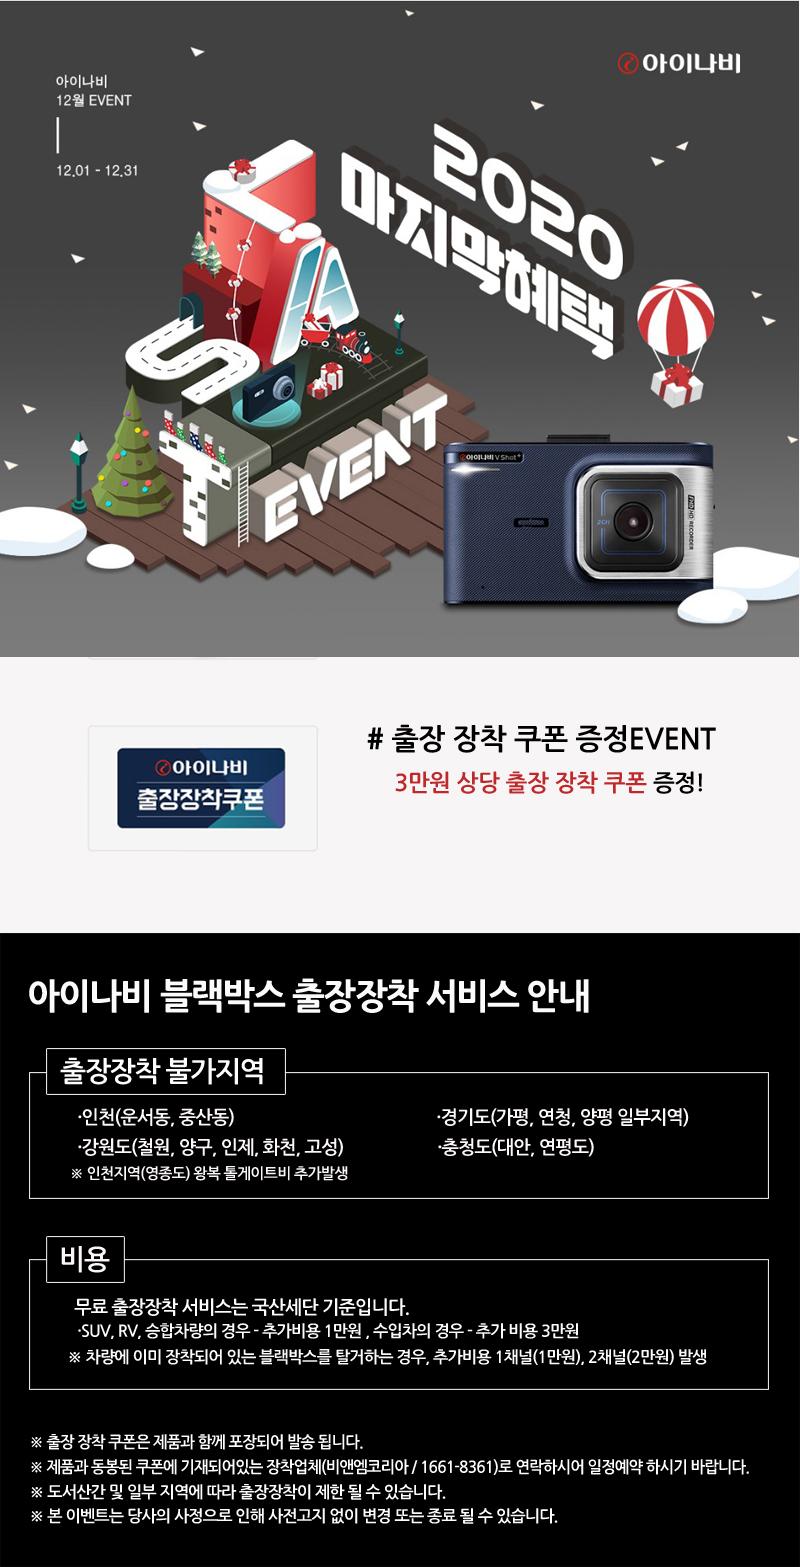 inavi_event.jpg